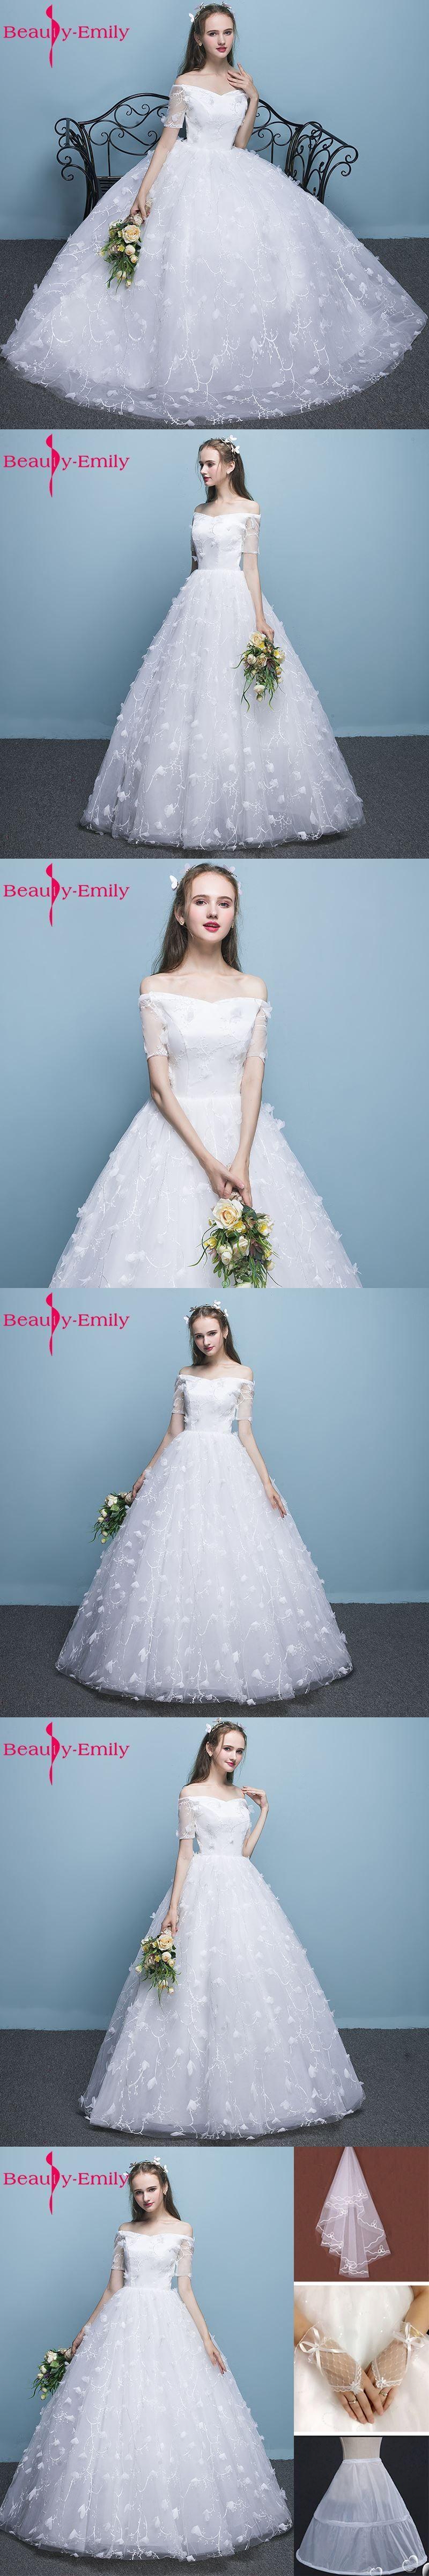 Beauty-Emily Normal Bride Simple White Wedding Dresses 2017 V-Neck ...